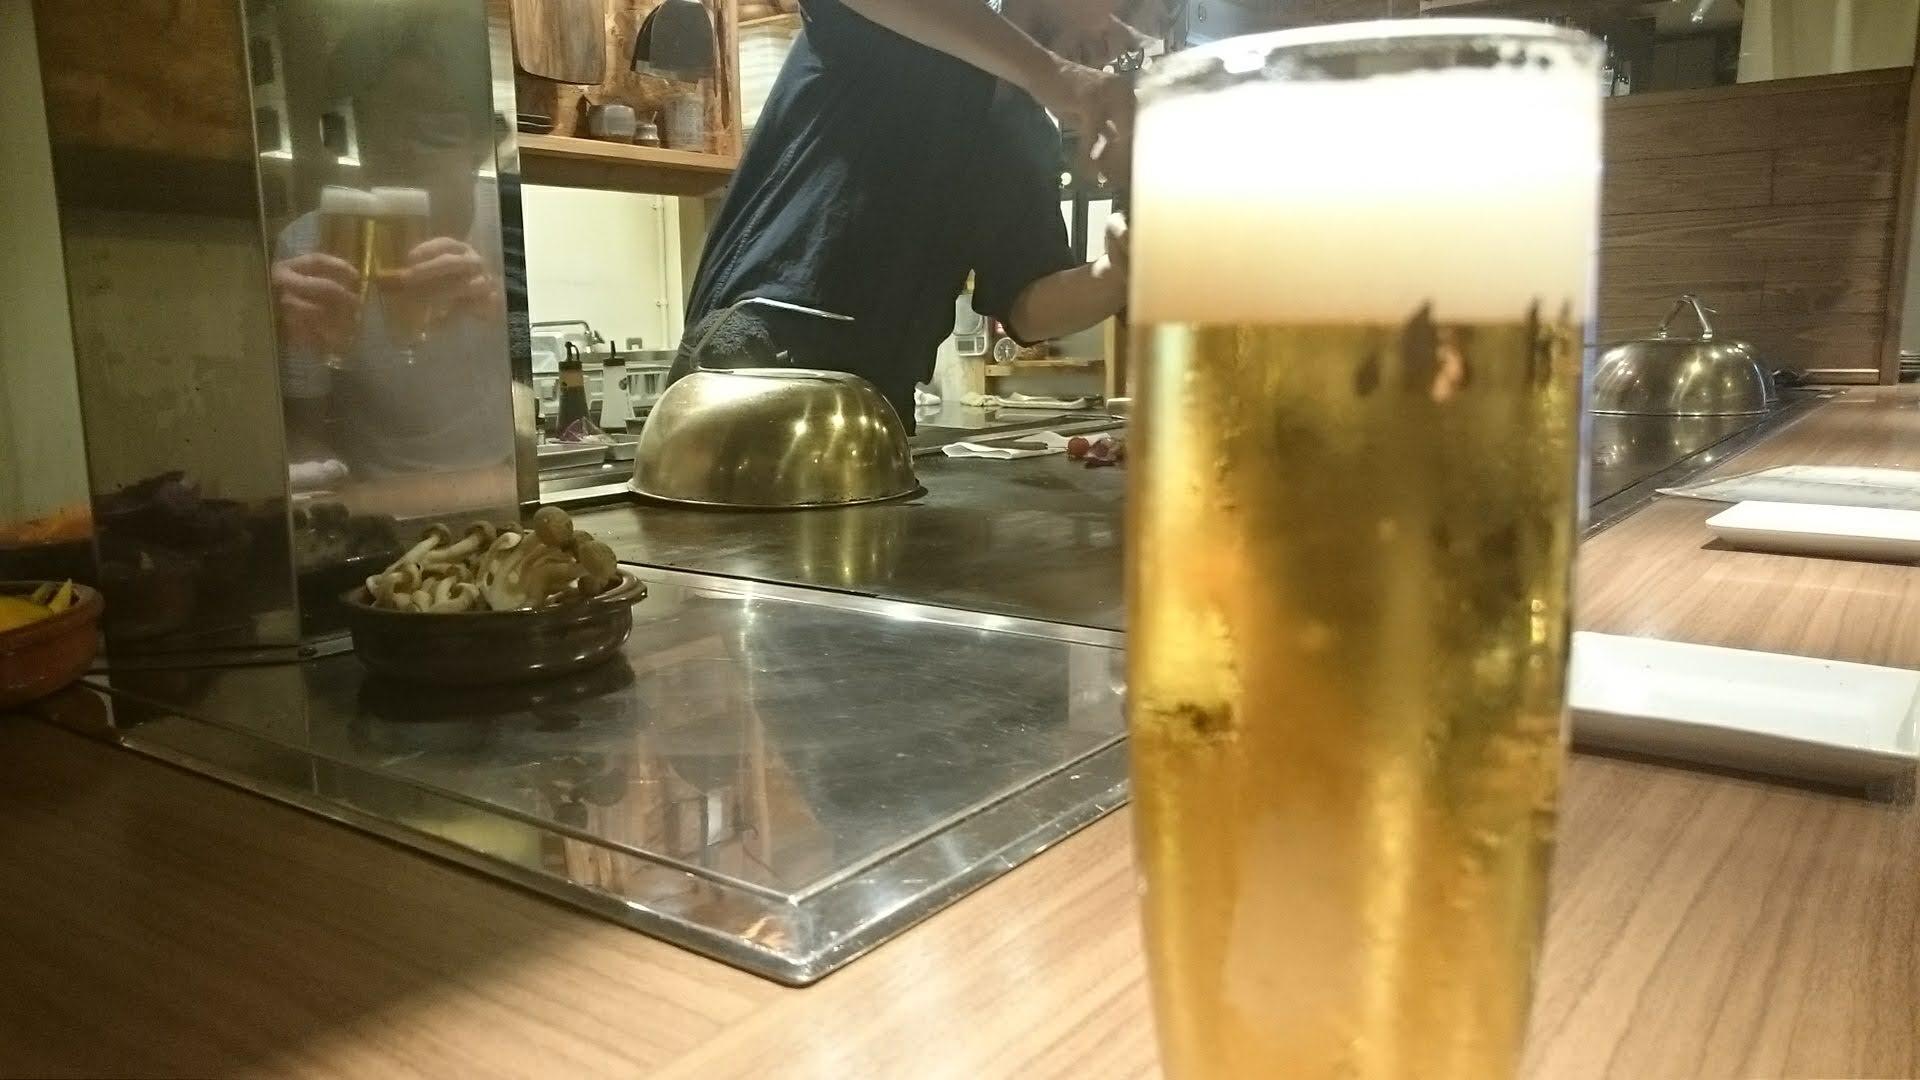 tomozoグラスビール